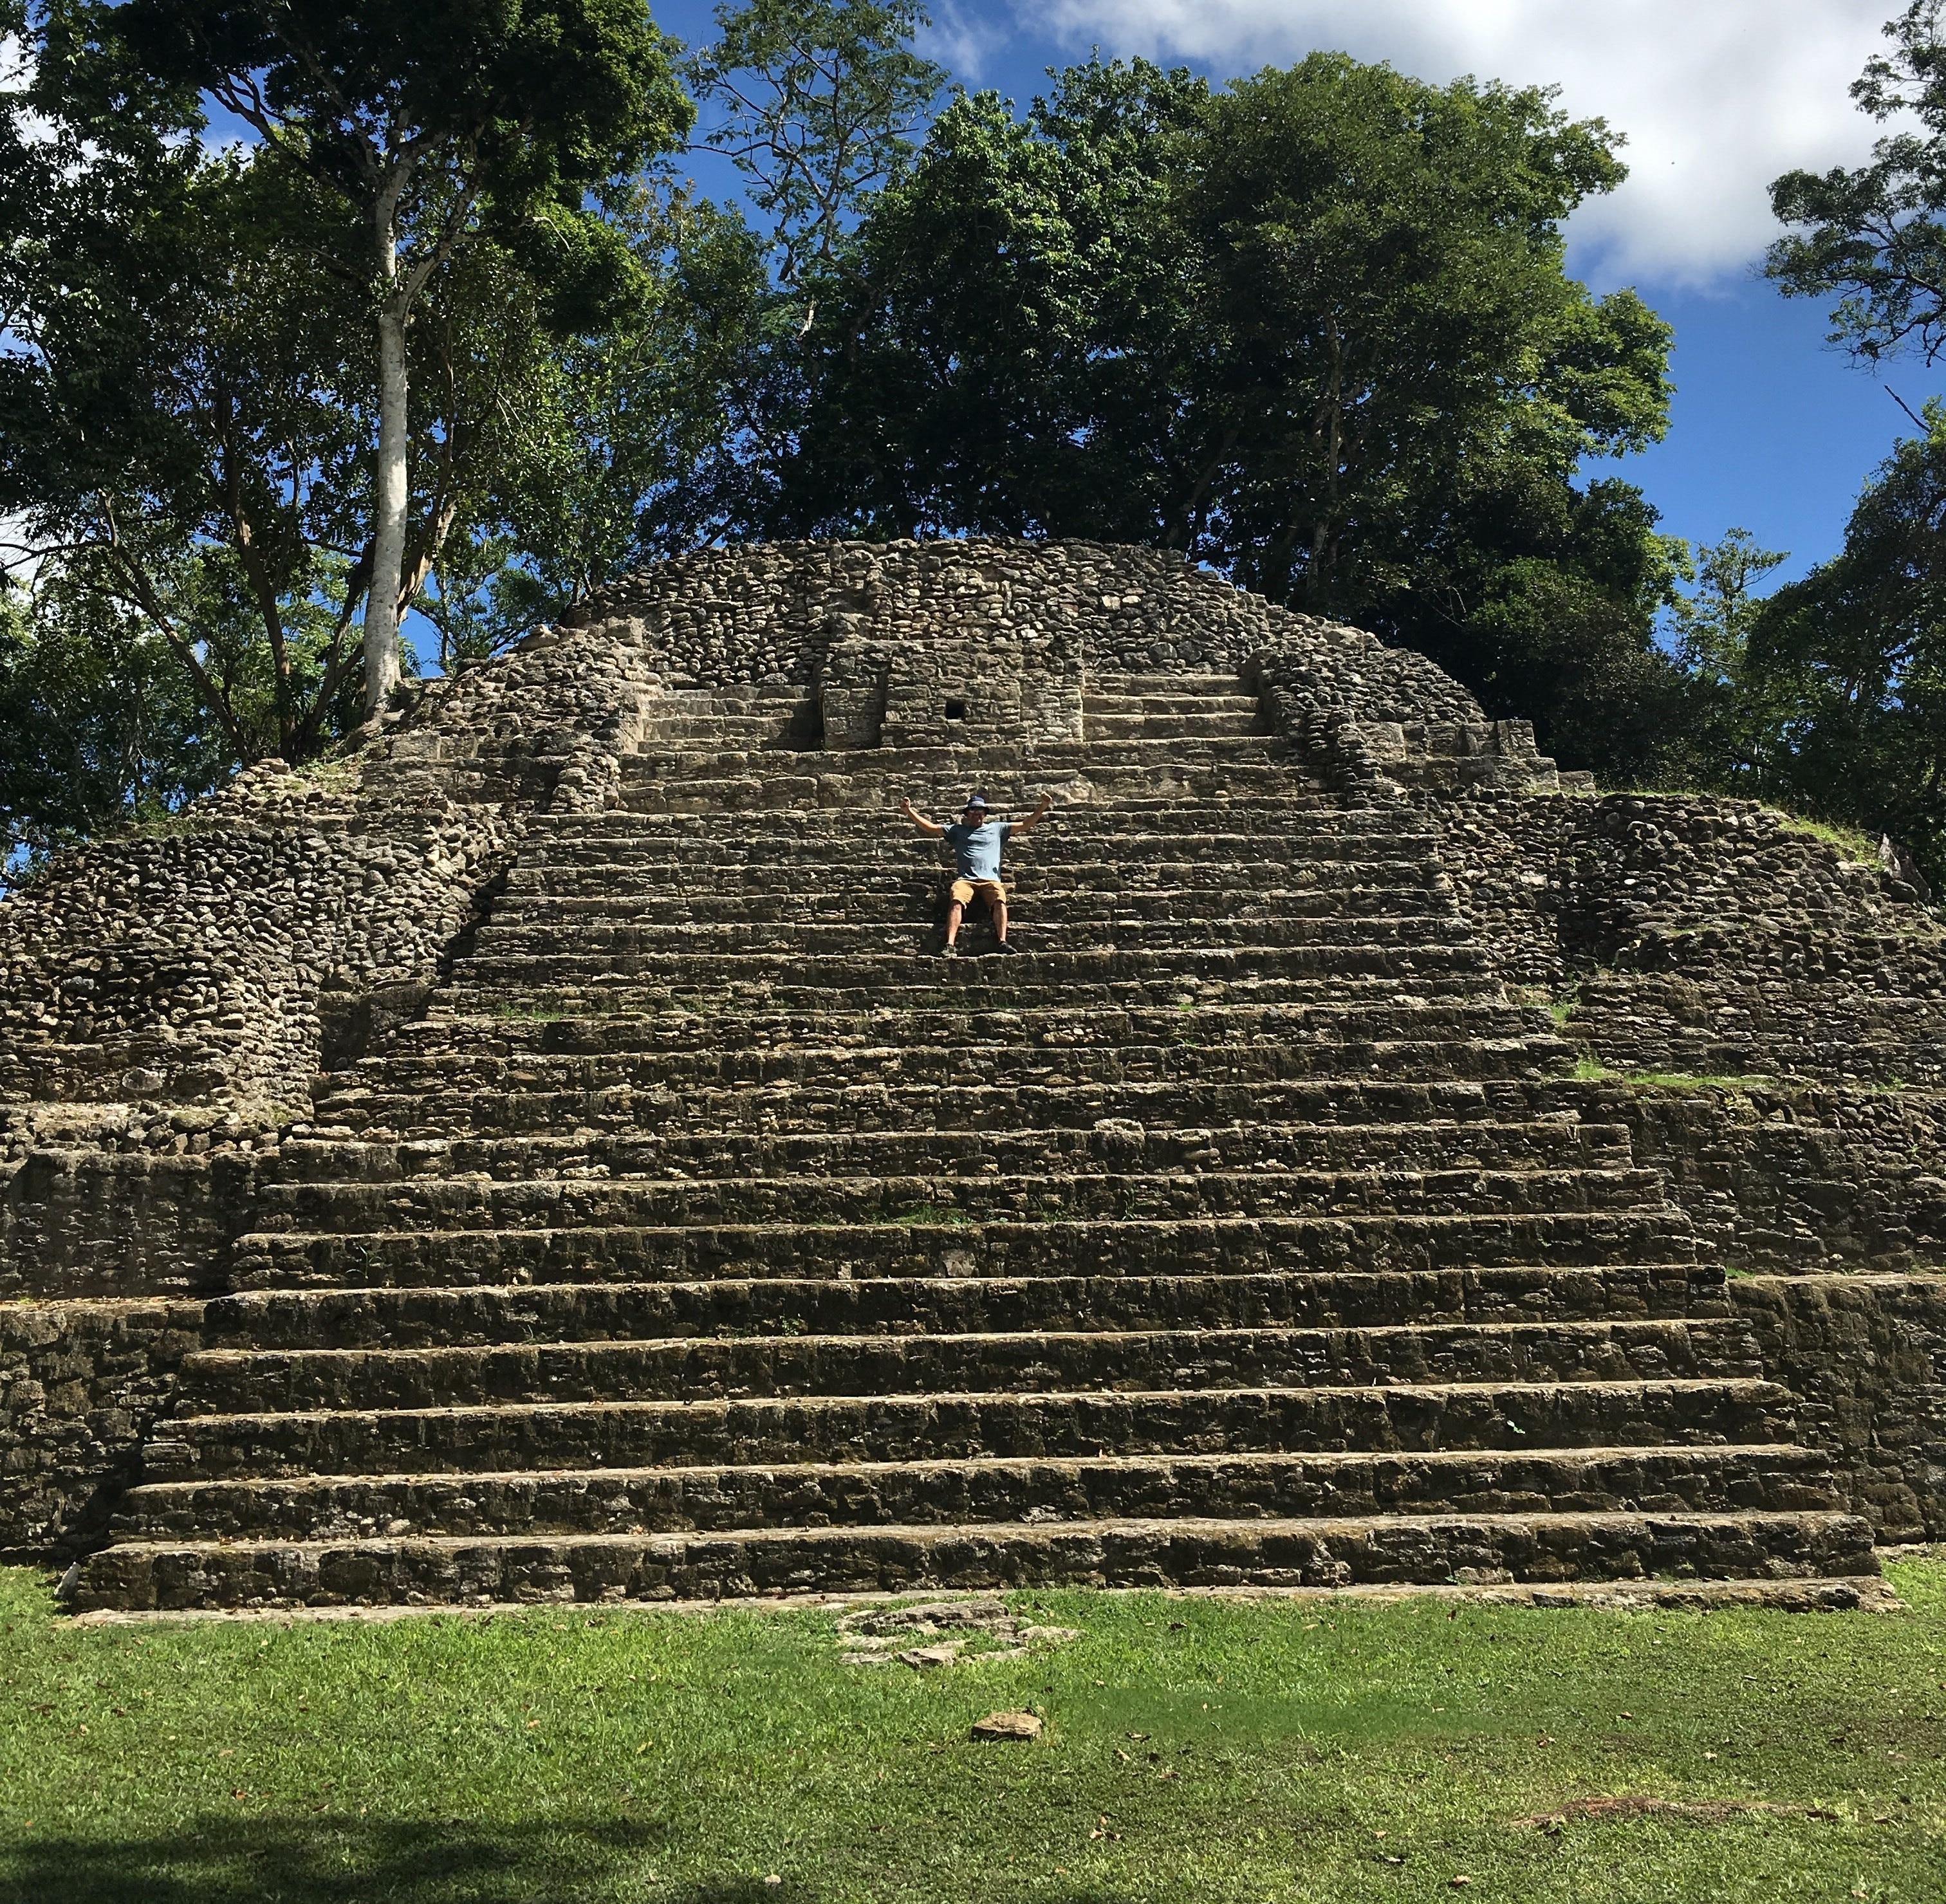 San Ignacio, Cayo District, Belize